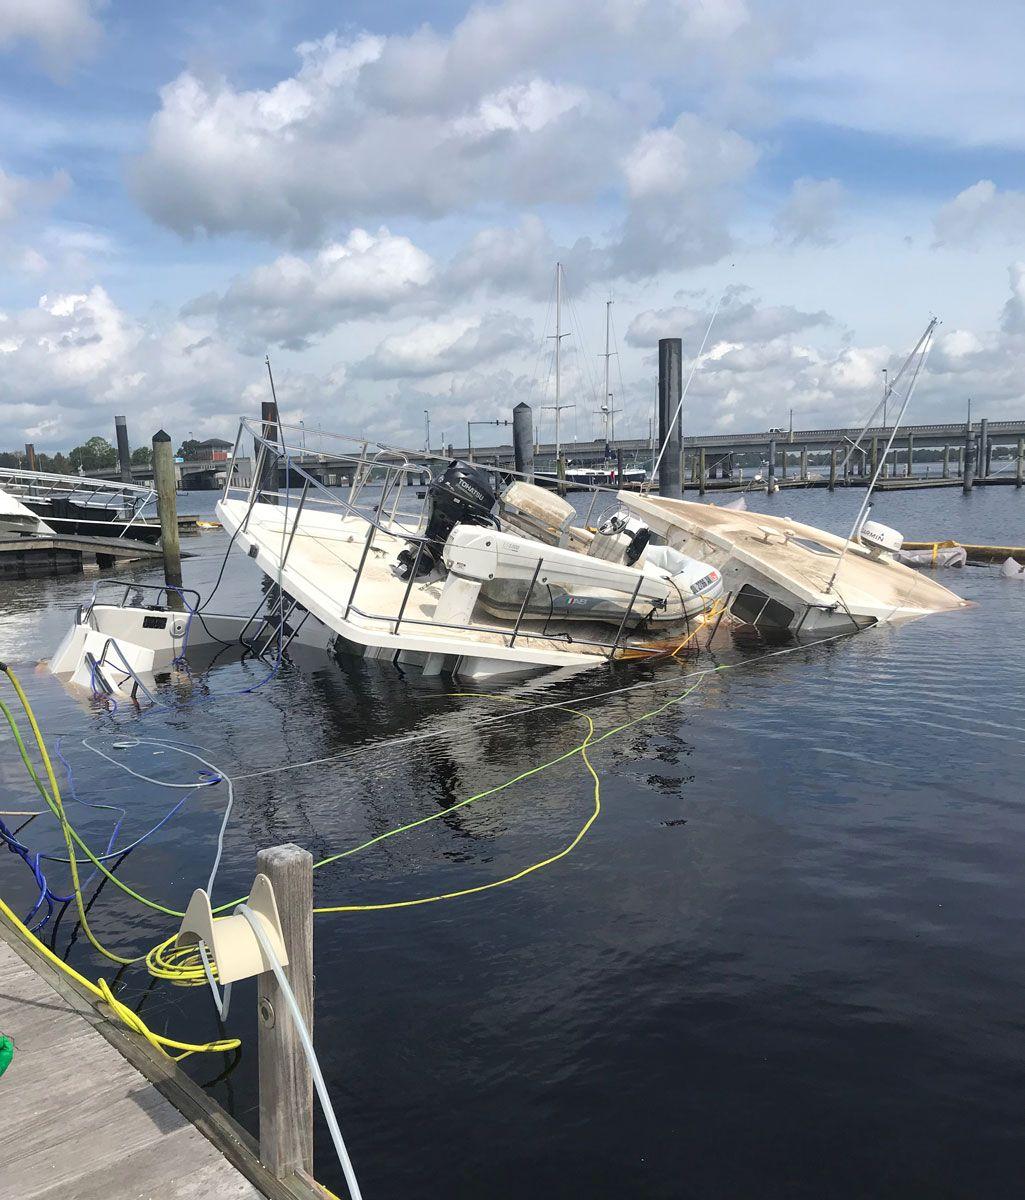 Sunken Boat Recovery Service